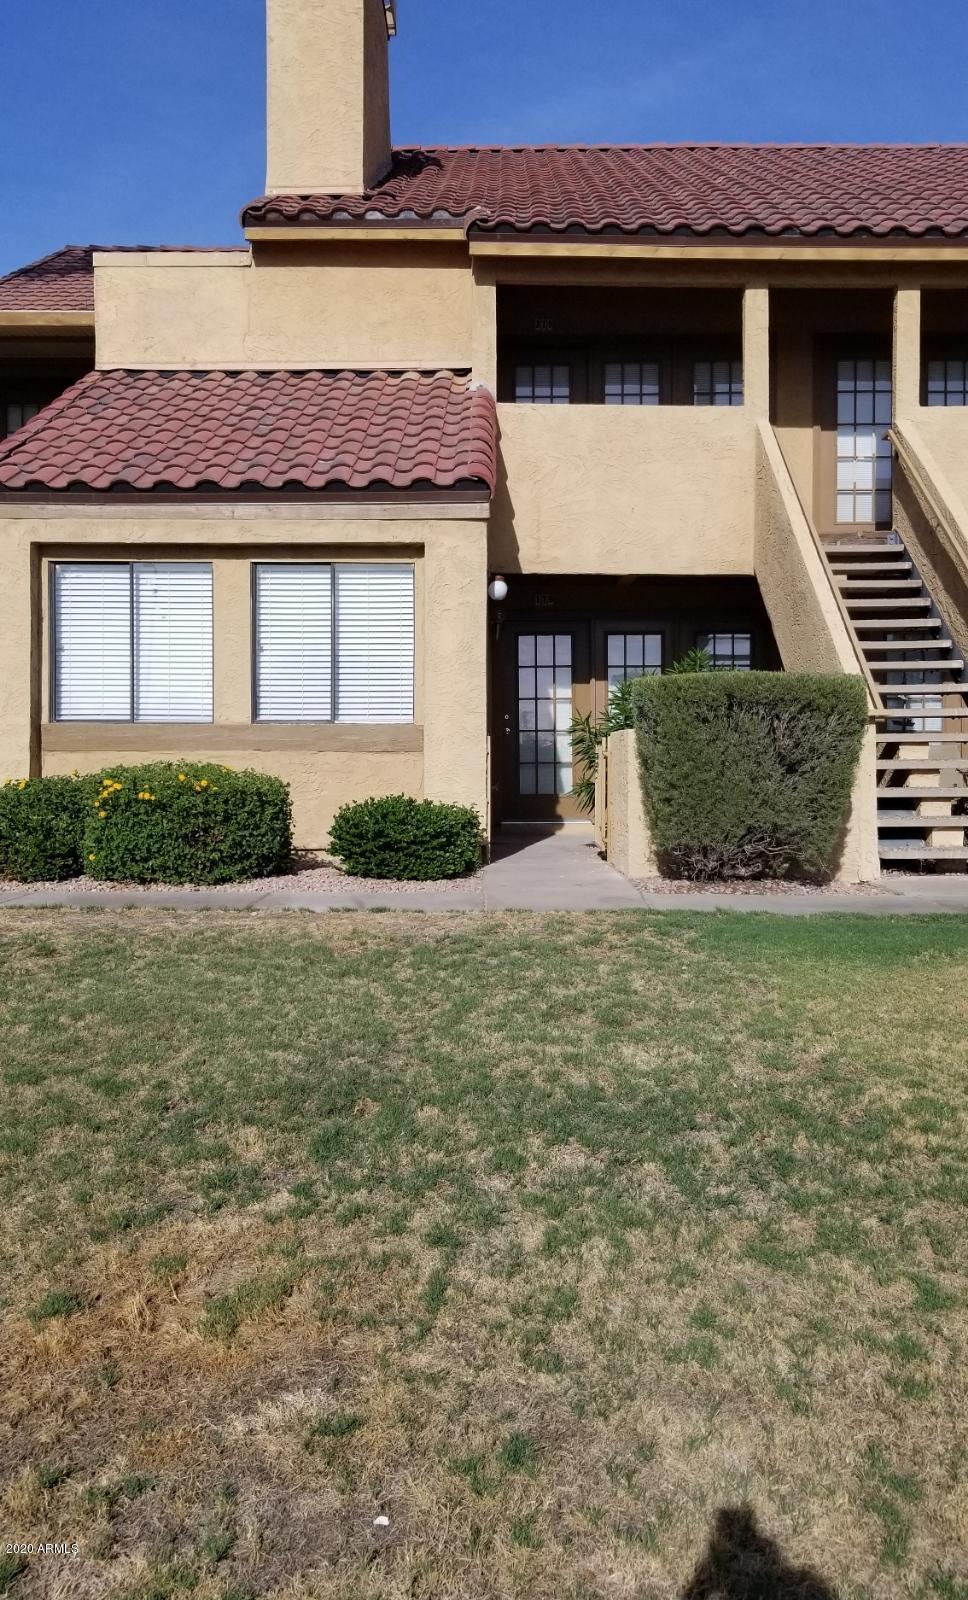 Photo of 4901 S CALLE LOS CERROS Drive #179, Tempe, AZ 85282